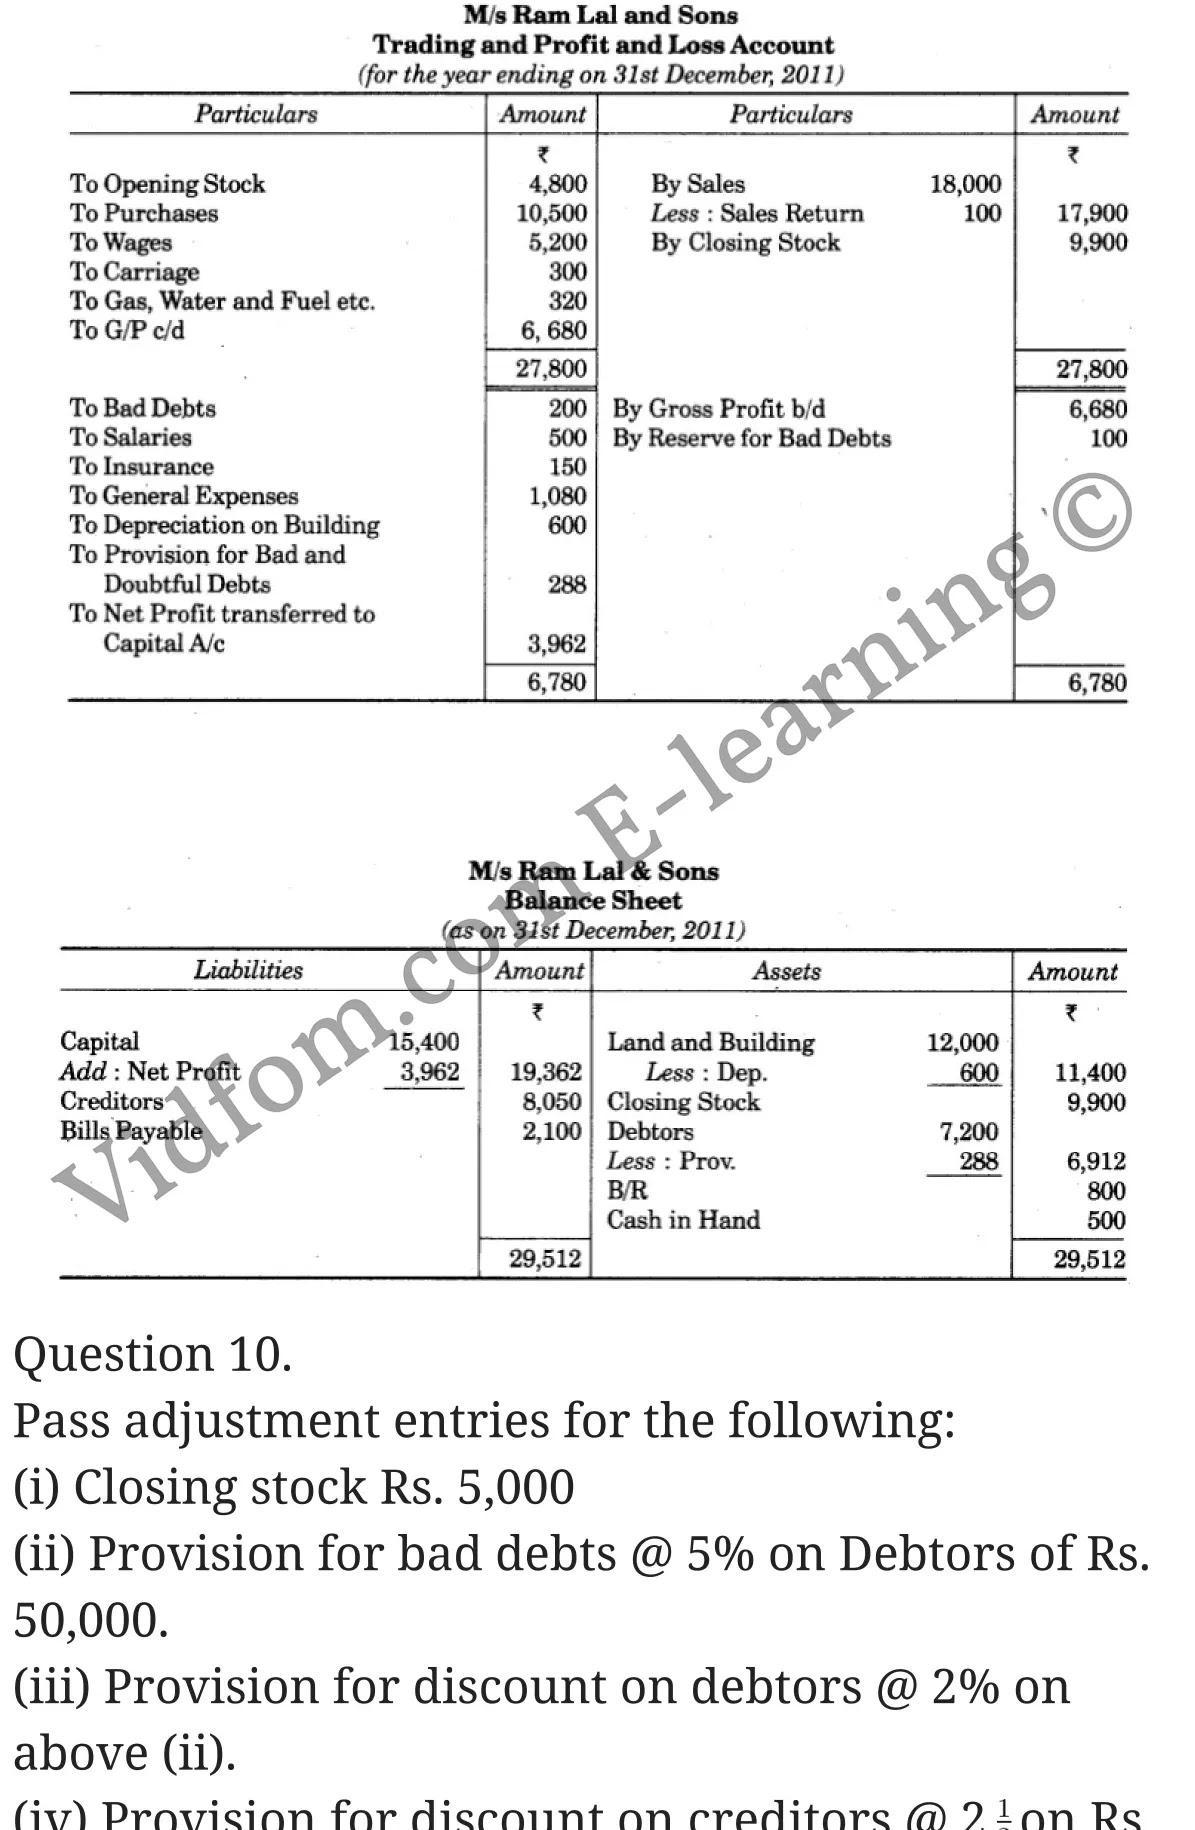 कक्षा 10 वाणिज्य  के नोट्स  हिंदी में एनसीईआरटी समाधान,     class 10 commerce Chapter 2,   class 10 commerce Chapter 2 ncert solutions in english,   class 10 commerce Chapter 2 notes in english,   class 10 commerce Chapter 2 question answer,   class 10 commerce Chapter 2 notes,   class 10 commerce Chapter 2 class 10 commerce Chapter 2 in  english,    class 10 commerce Chapter 2 important questions in  english,   class 10 commerce Chapter 2 notes in english,    class 10 commerce Chapter 2 test,   class 10 commerce Chapter 2 pdf,   class 10 commerce Chapter 2 notes pdf,   class 10 commerce Chapter 2 exercise solutions,   class 10 commerce Chapter 2 notes study rankers,   class 10 commerce Chapter 2 notes,    class 10 commerce Chapter 2  class 10  notes pdf,   class 10 commerce Chapter 2 class 10  notes  ncert,   class 10 commerce Chapter 2 class 10 pdf,   class 10 commerce Chapter 2  book,   class 10 commerce Chapter 2 quiz class 10  ,    10  th class 10 commerce Chapter 2  book up board,   up board 10  th class 10 commerce Chapter 2 notes,  class 10 commerce,   class 10 commerce ncert solutions in english,   class 10 commerce notes in english,   class 10 commerce question answer,   class 10 commerce notes,  class 10 commerce class 10 commerce Chapter 2 in  english,    class 10 commerce important questions in  english,   class 10 commerce notes in english,    class 10 commerce test,  class 10 commerce class 10 commerce Chapter 2 pdf,   class 10 commerce notes pdf,   class 10 commerce exercise solutions,   class 10 commerce,  class 10 commerce notes study rankers,   class 10 commerce notes,  class 10 commerce notes,   class 10 commerce  class 10  notes pdf,   class 10 commerce class 10  notes  ncert,   class 10 commerce class 10 pdf,   class 10 commerce  book,  class 10 commerce quiz class 10  ,  10 th class 10 commerce    book up board,    up board 10 th class 10 commerce notes,     कक्षा 10 वाणिज्य अध्याय 2 ,  कक्षा 10 वाणिज्य, कक्षा 10 वाणिज्य अध्याय 2  के नोट्स हिं